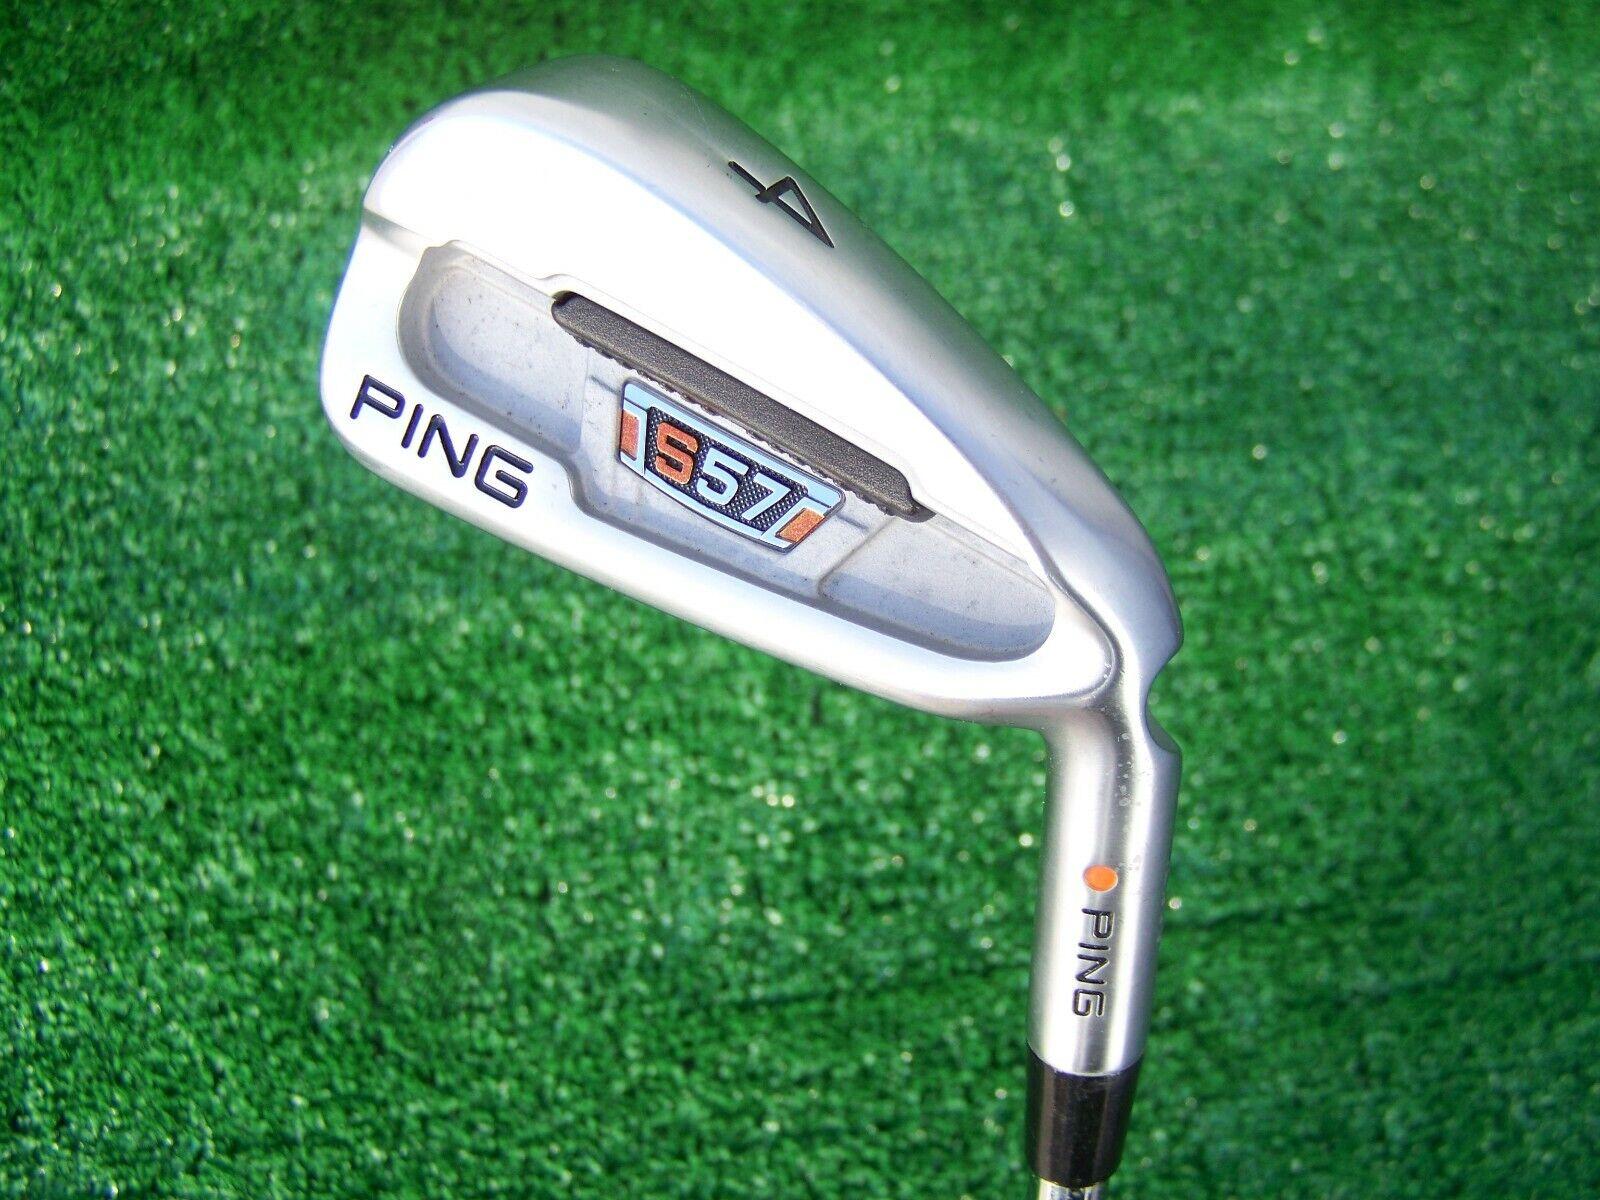 Ping Golf S57 4 Iron Orange Color Code DG Steel Stiff Flex Shaft Right Hand